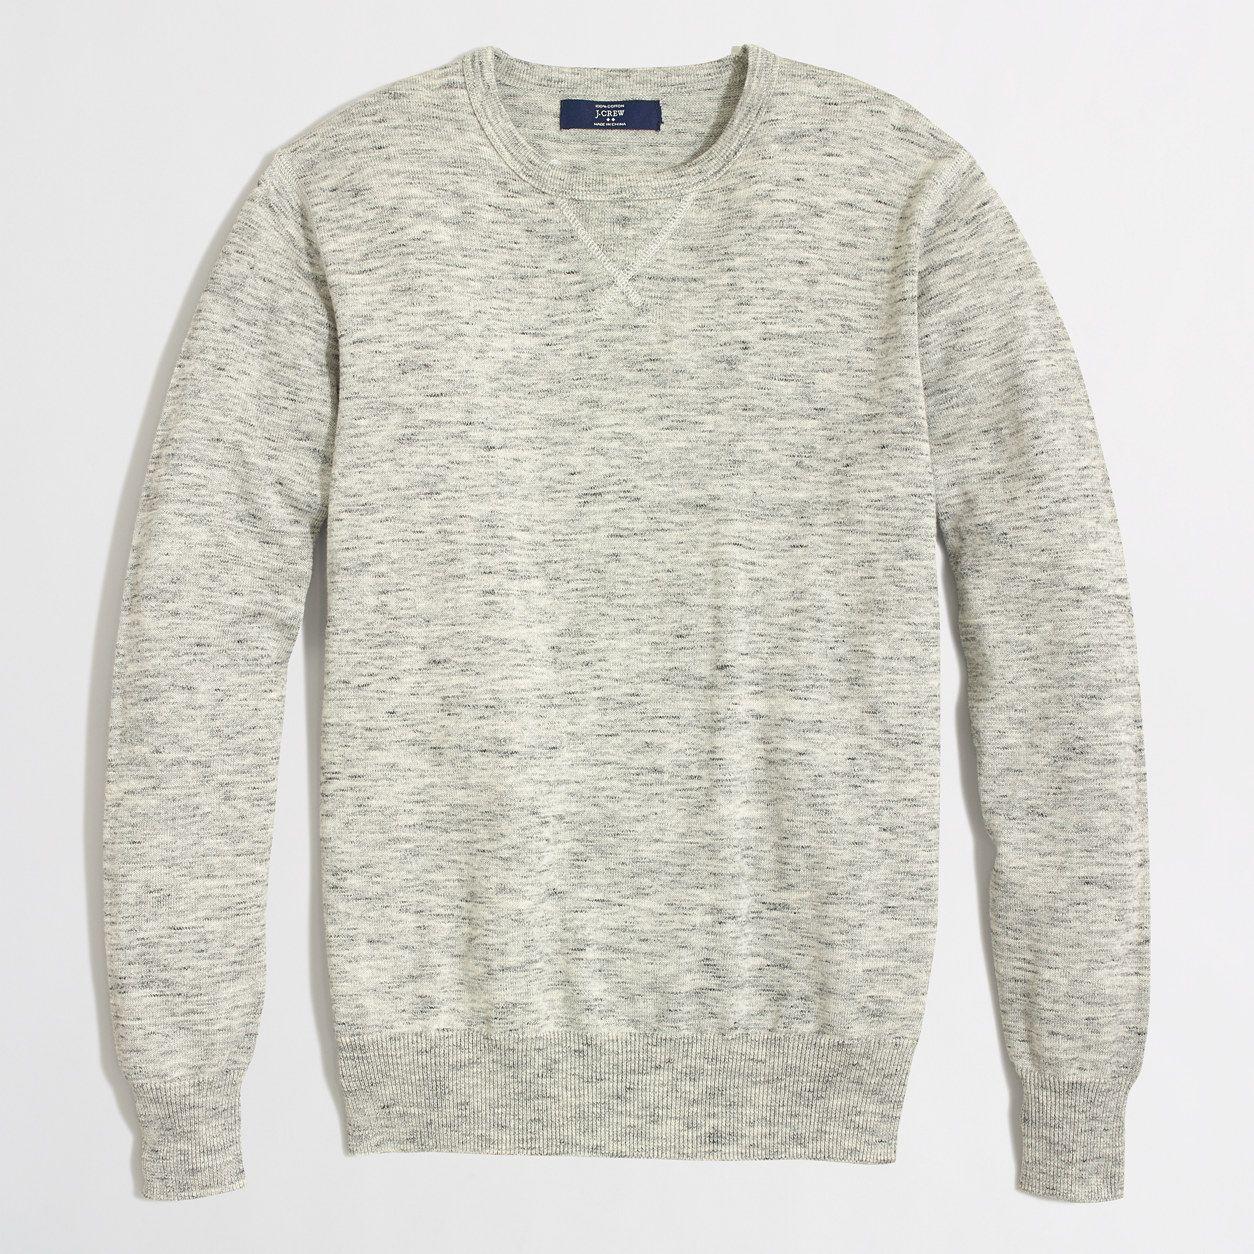 9d2869fe Factory heathered sweatshirt sweater : Cotton   J.Crew Factory